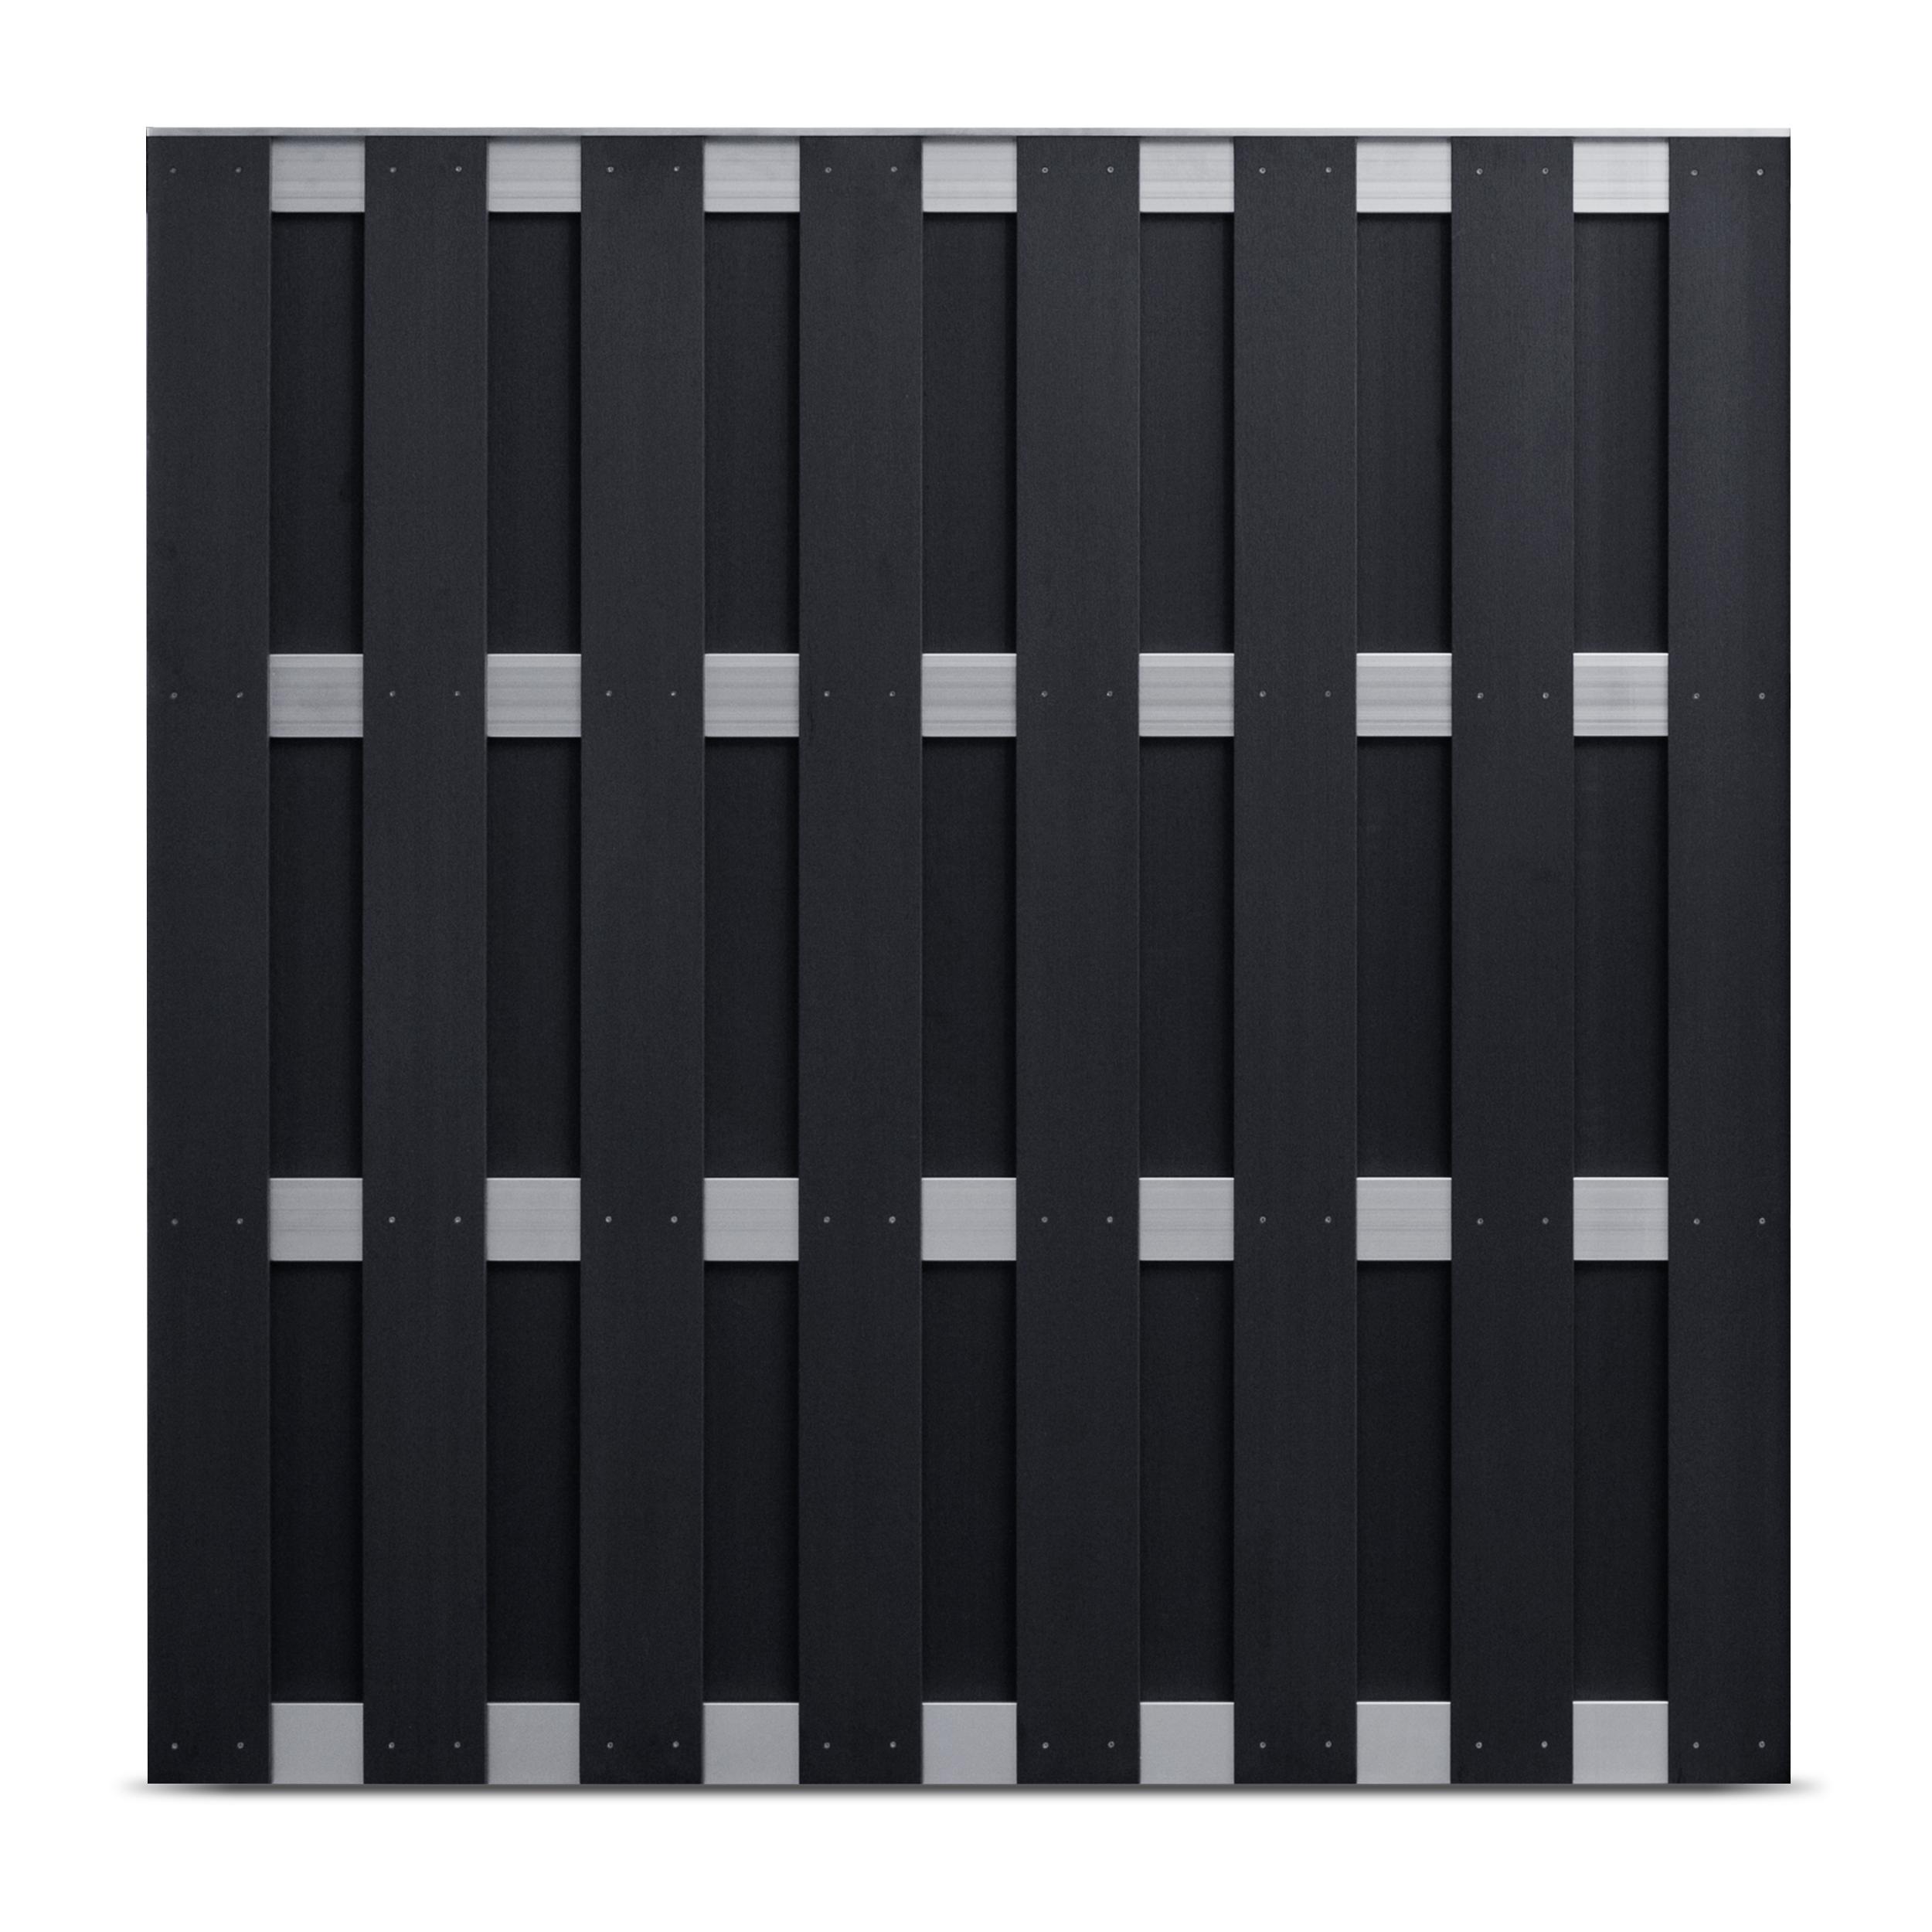 WPC Silver Line Fertigzaunelement 180 x 180 cm Anthrazit / Silber